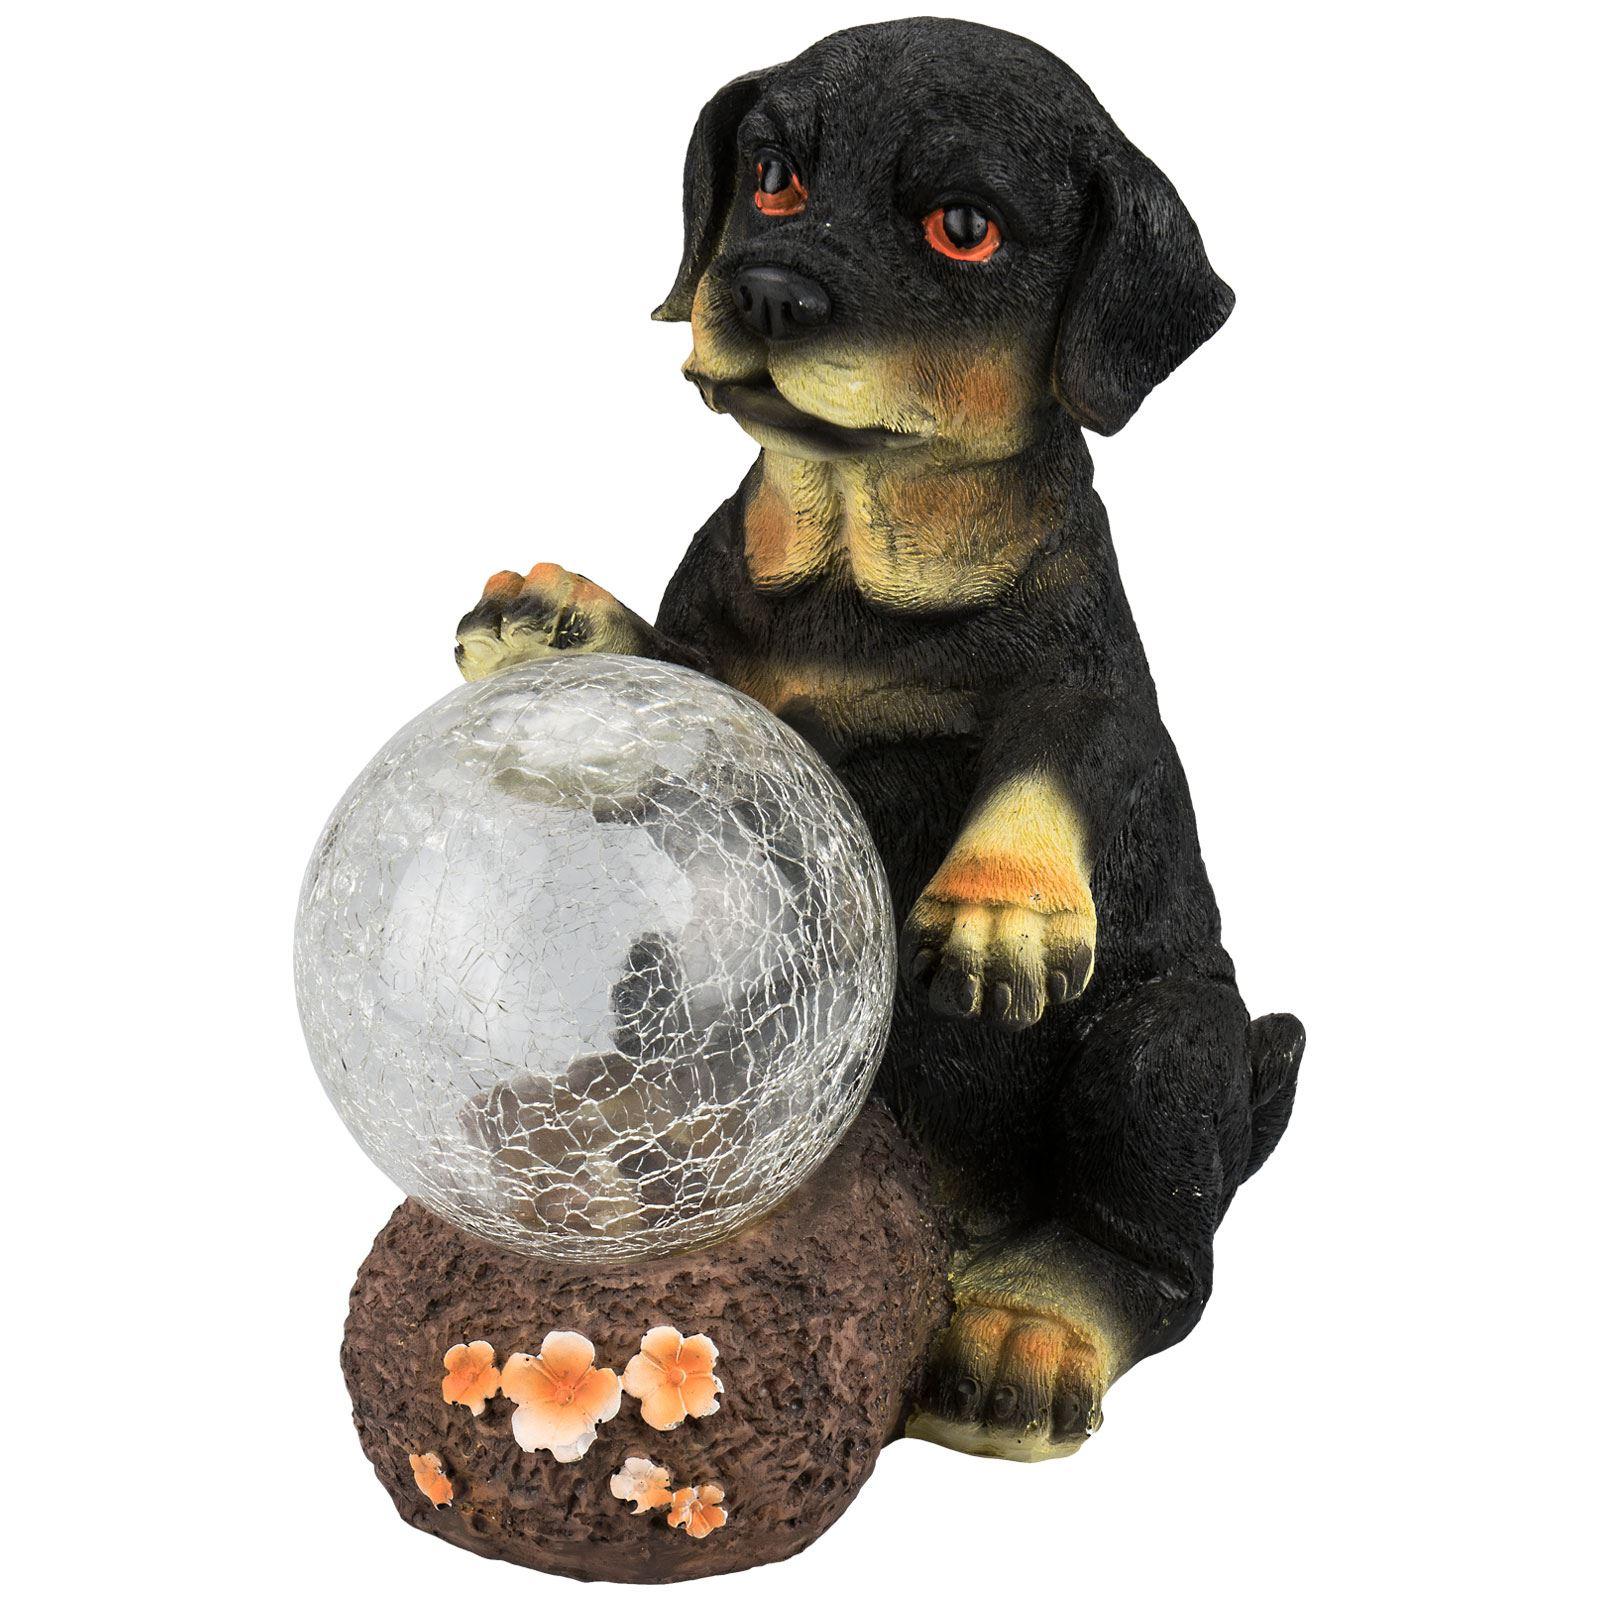 solaire nergie led chiot lumi re chien d coration jardin ornement de animal ebay. Black Bedroom Furniture Sets. Home Design Ideas